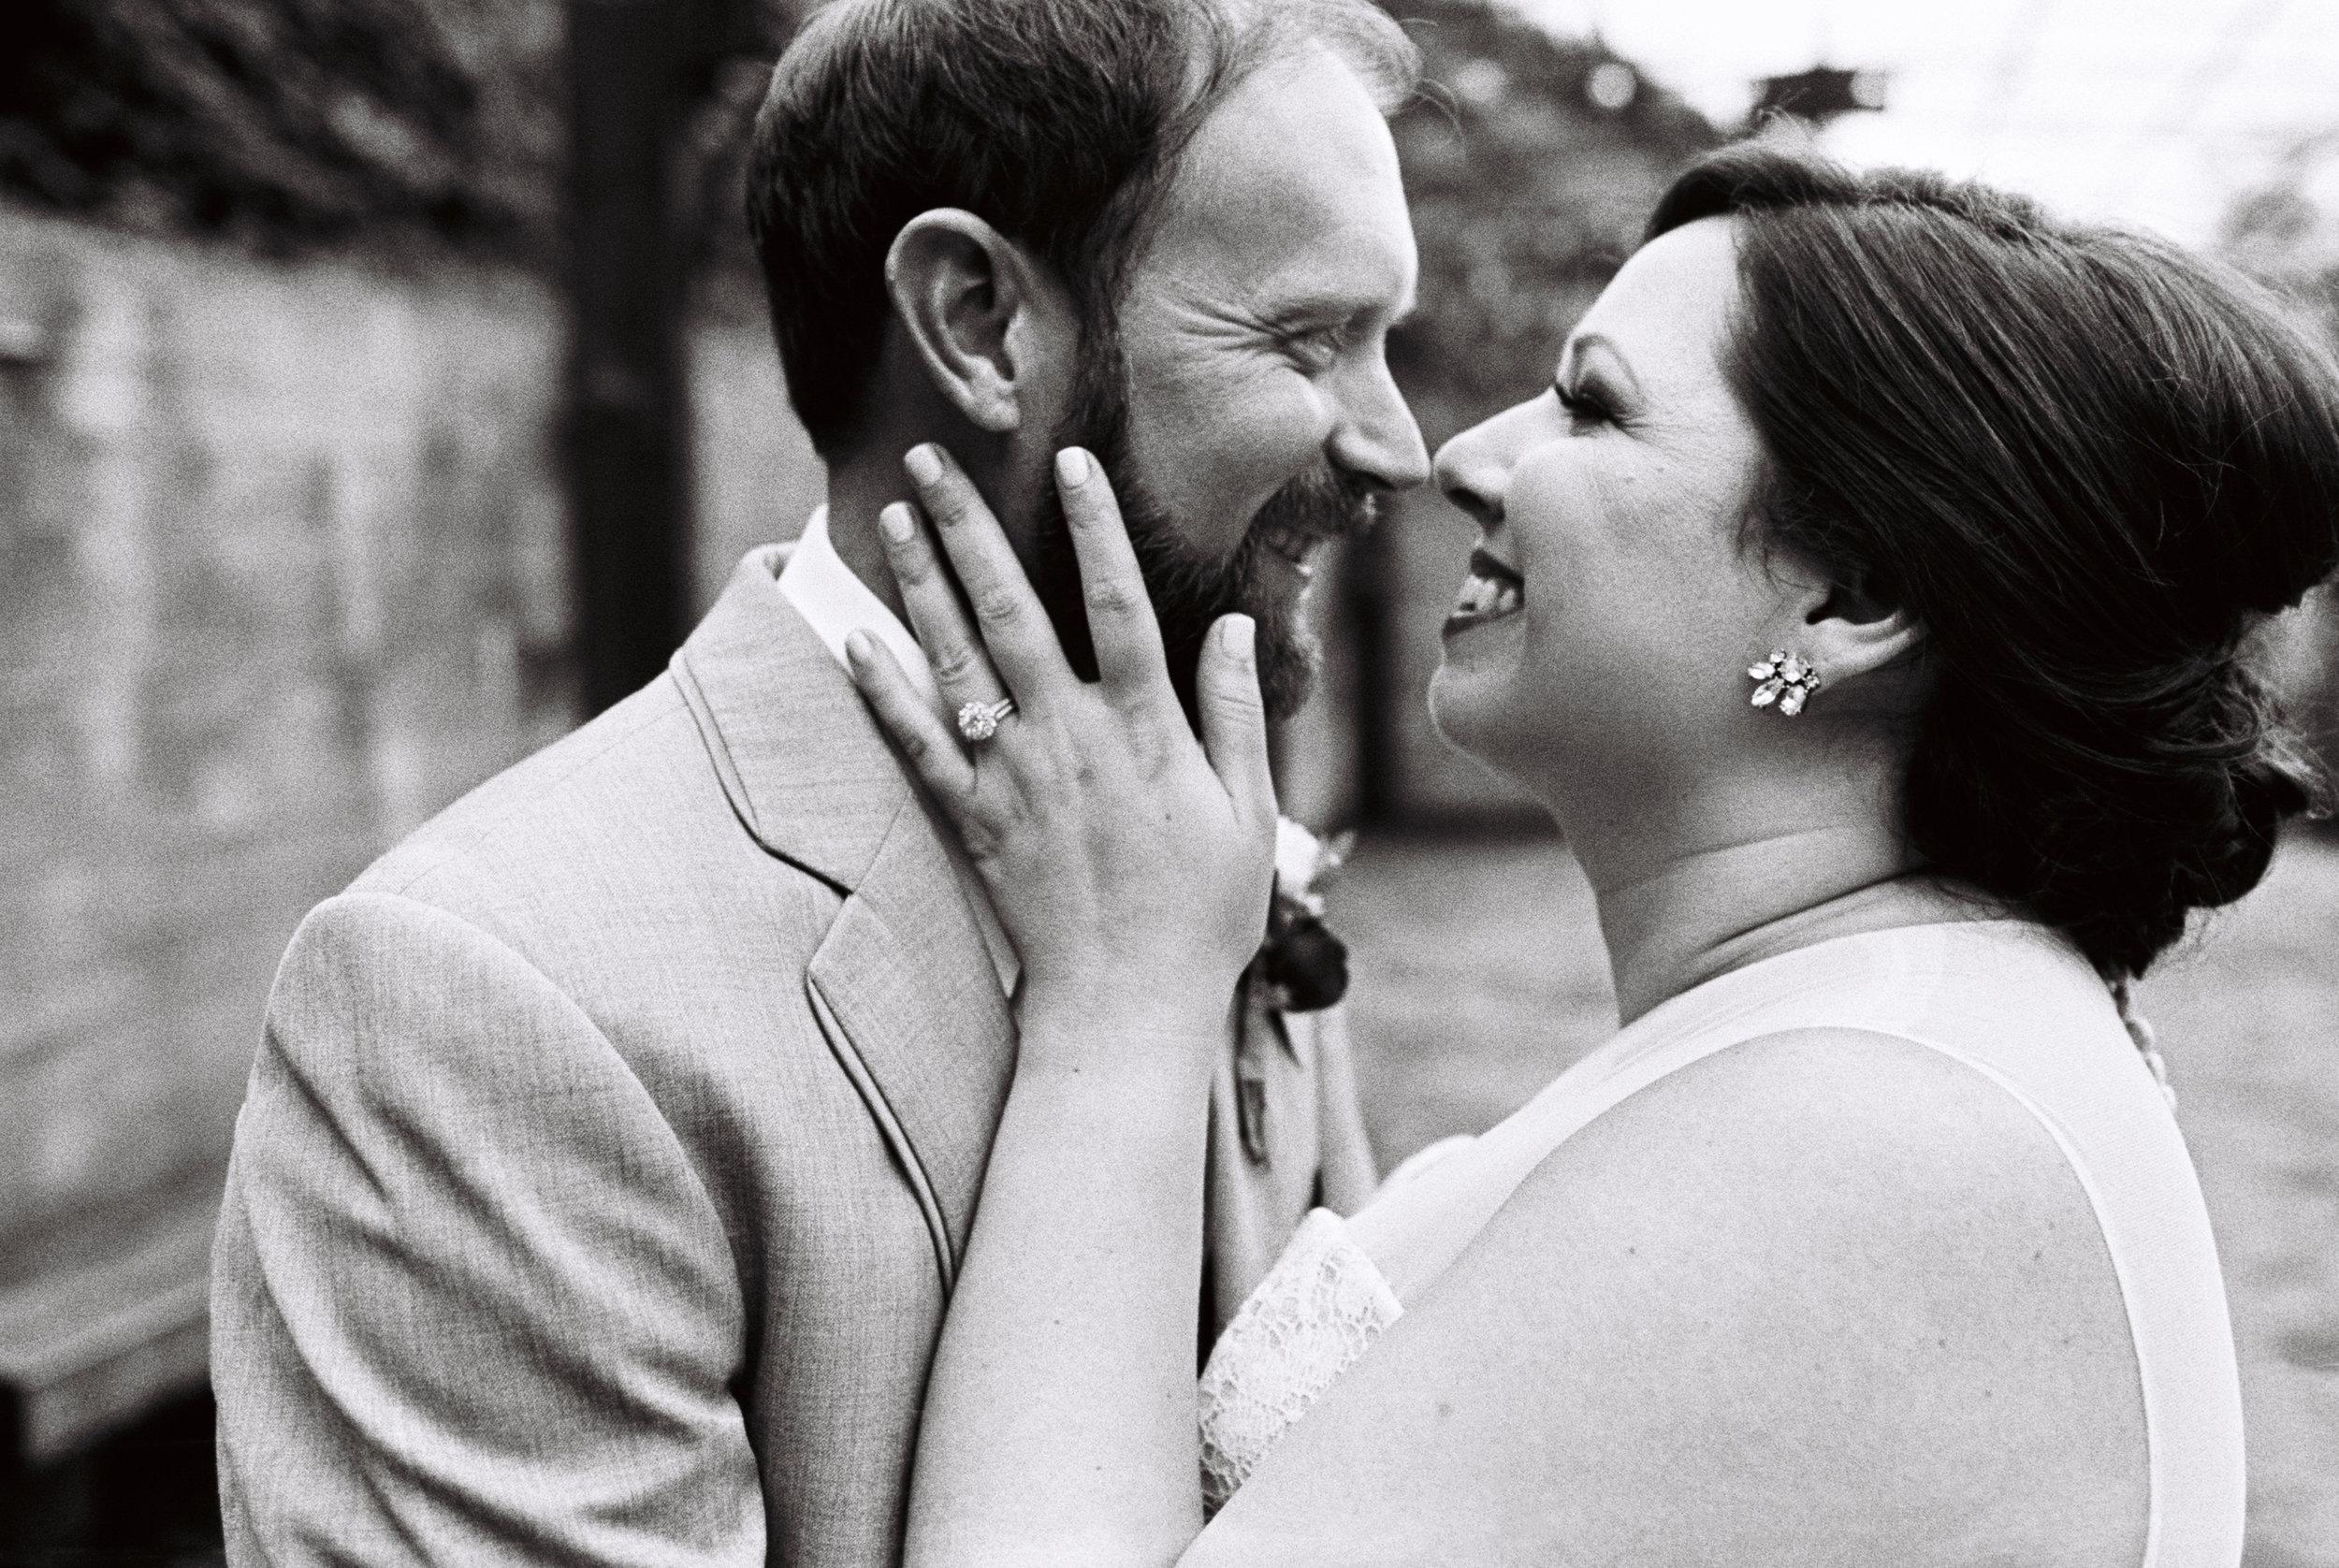 Jessica_Bryan_Wedding_Standard_Knoxville_Abigail_Malone_Photography-239.jpg